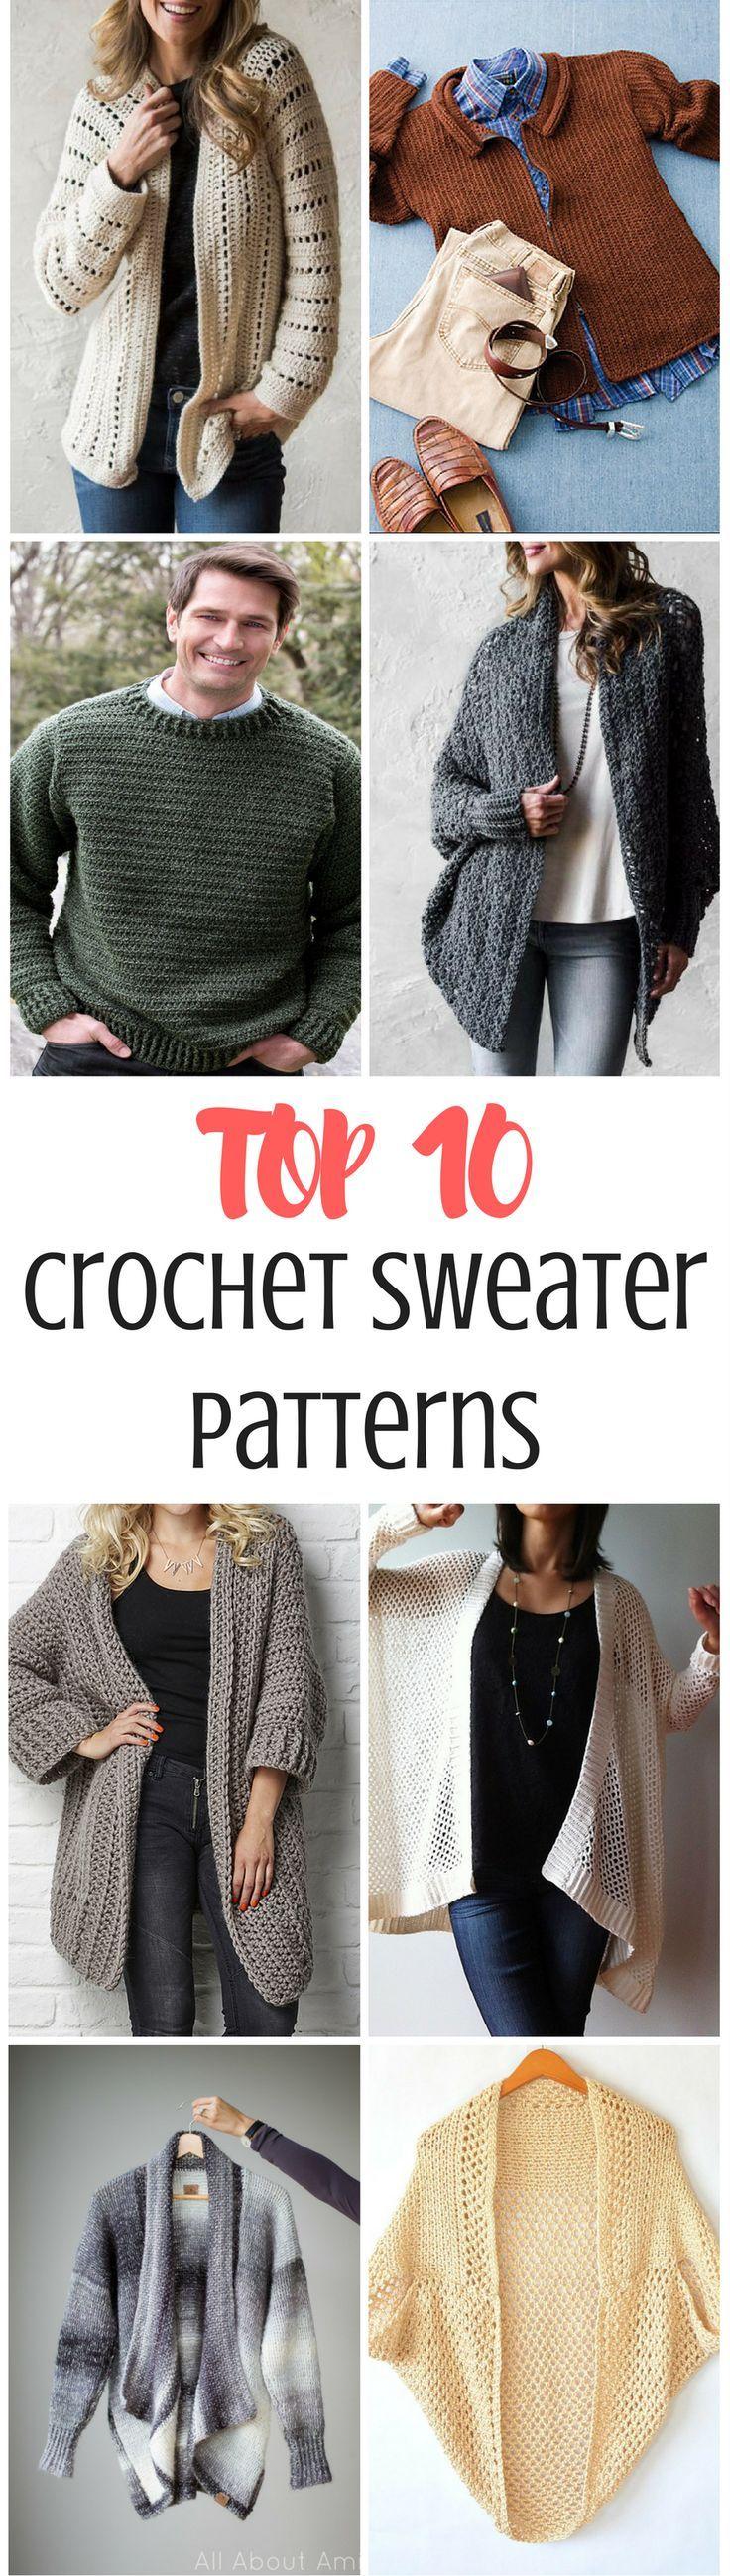 Top 10 Crochet Sweater Patterns | Crochet sweater patterns, Free ...